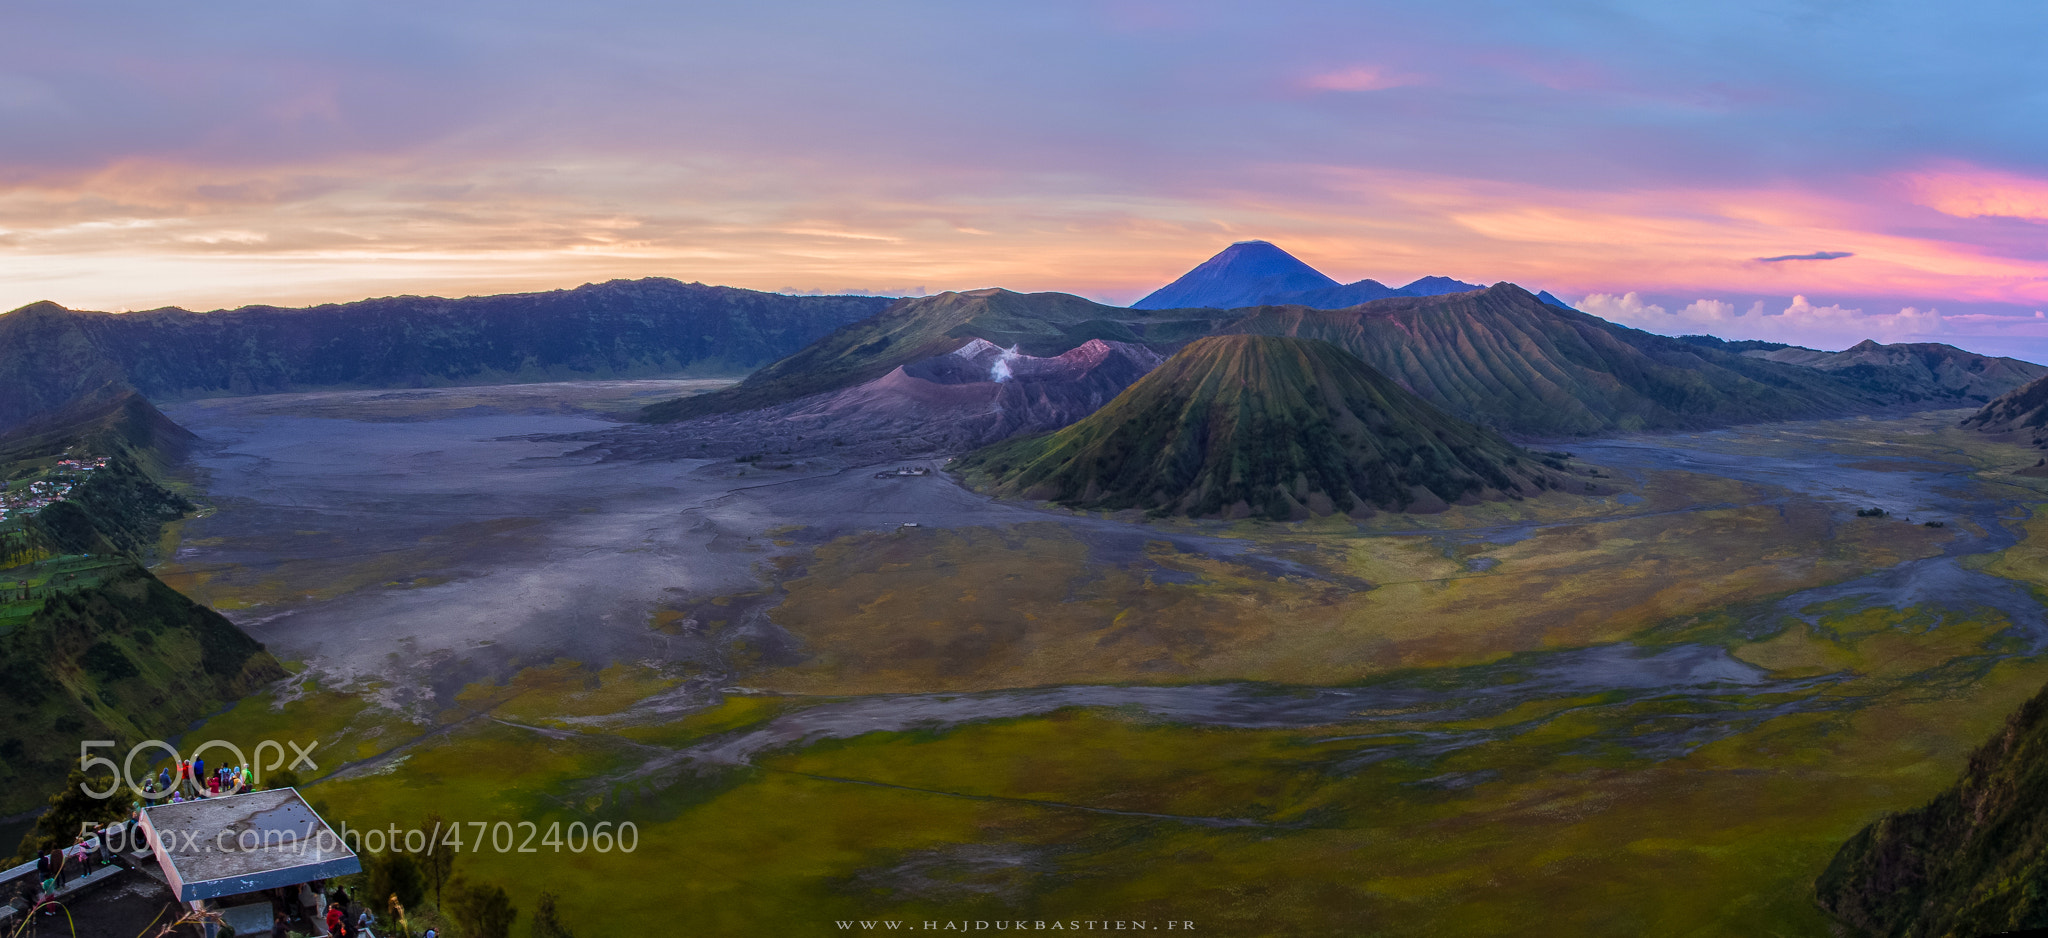 Photograph Sunrise on Bromo by Bastien HAJDUK on 500px